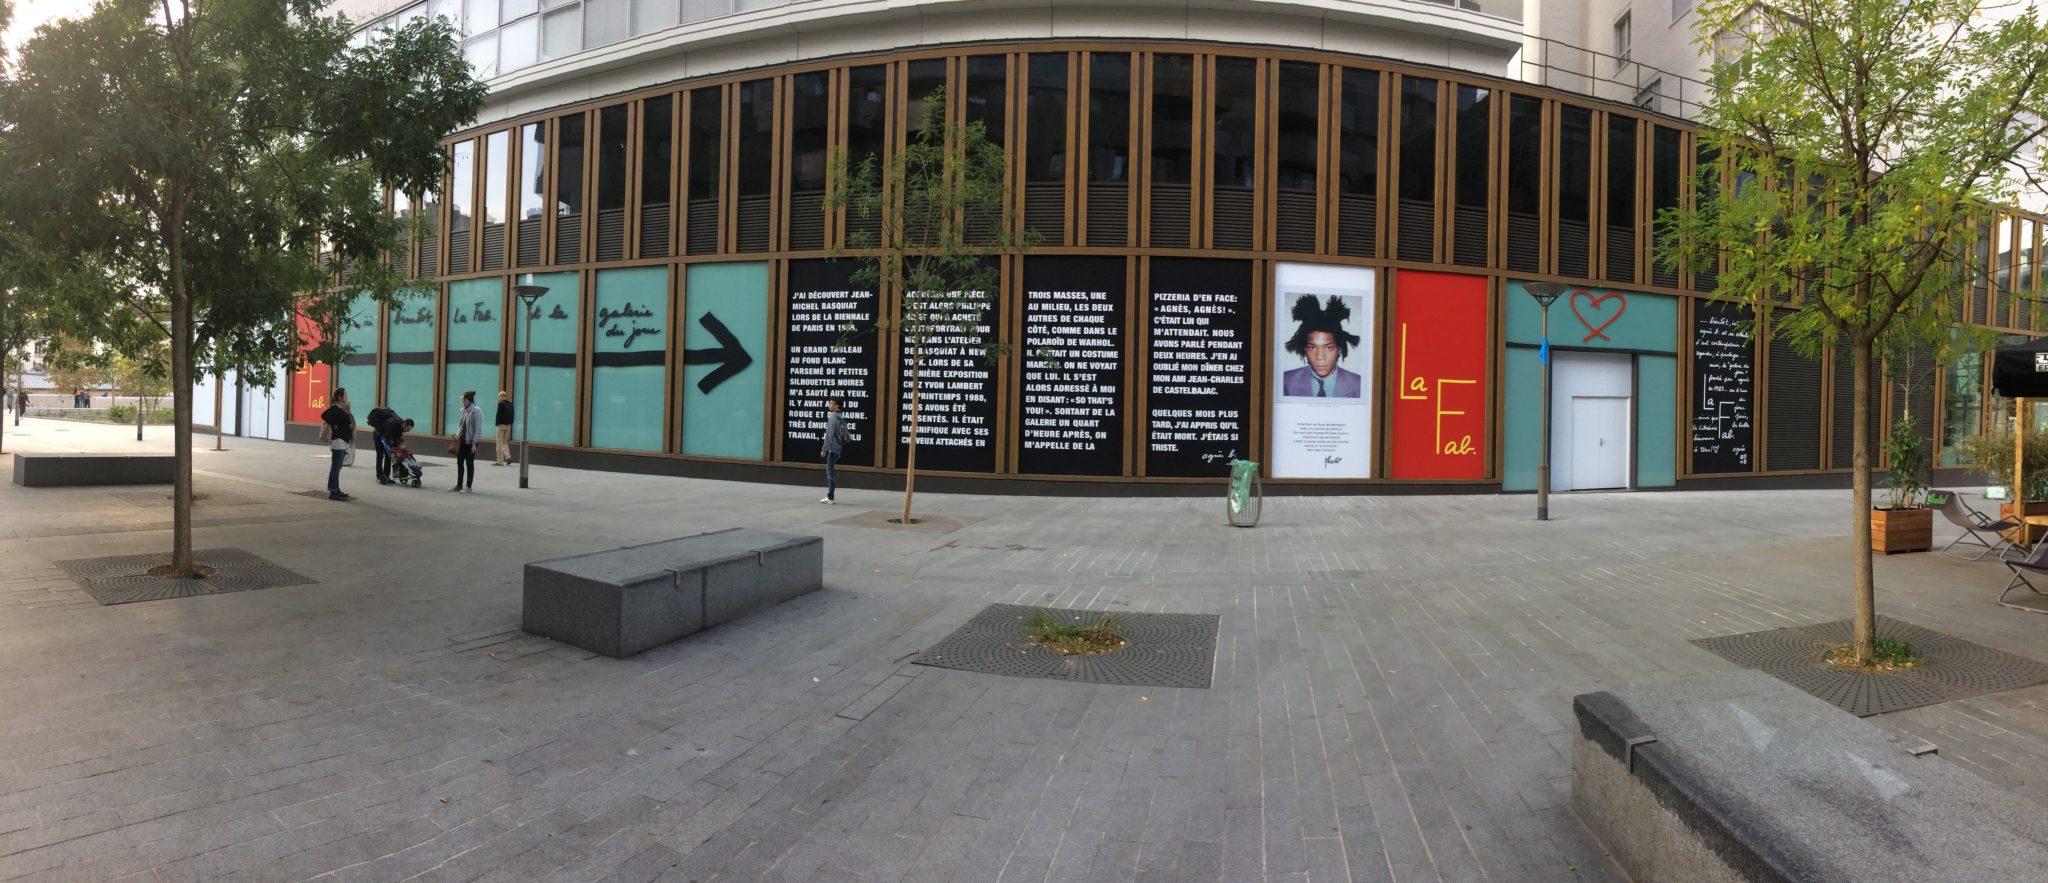 Vue de la façade de La Fab. © Copyright La Fab. View of La Fab.'s facade. © Copyright La Fab.